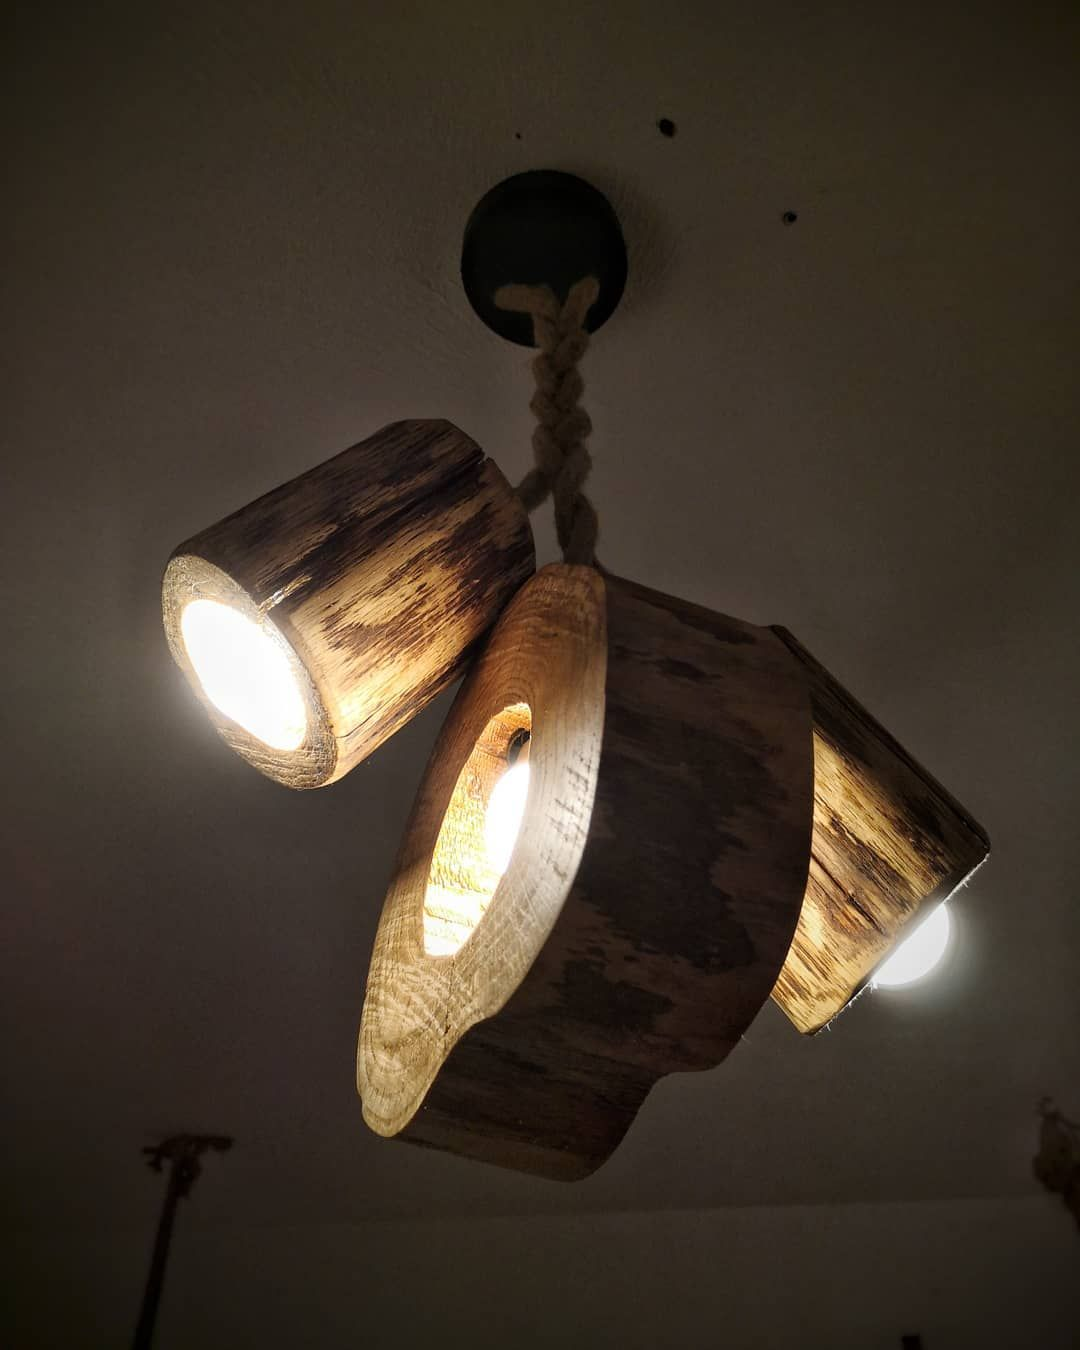 Pin Auf Ideen Aus Holz